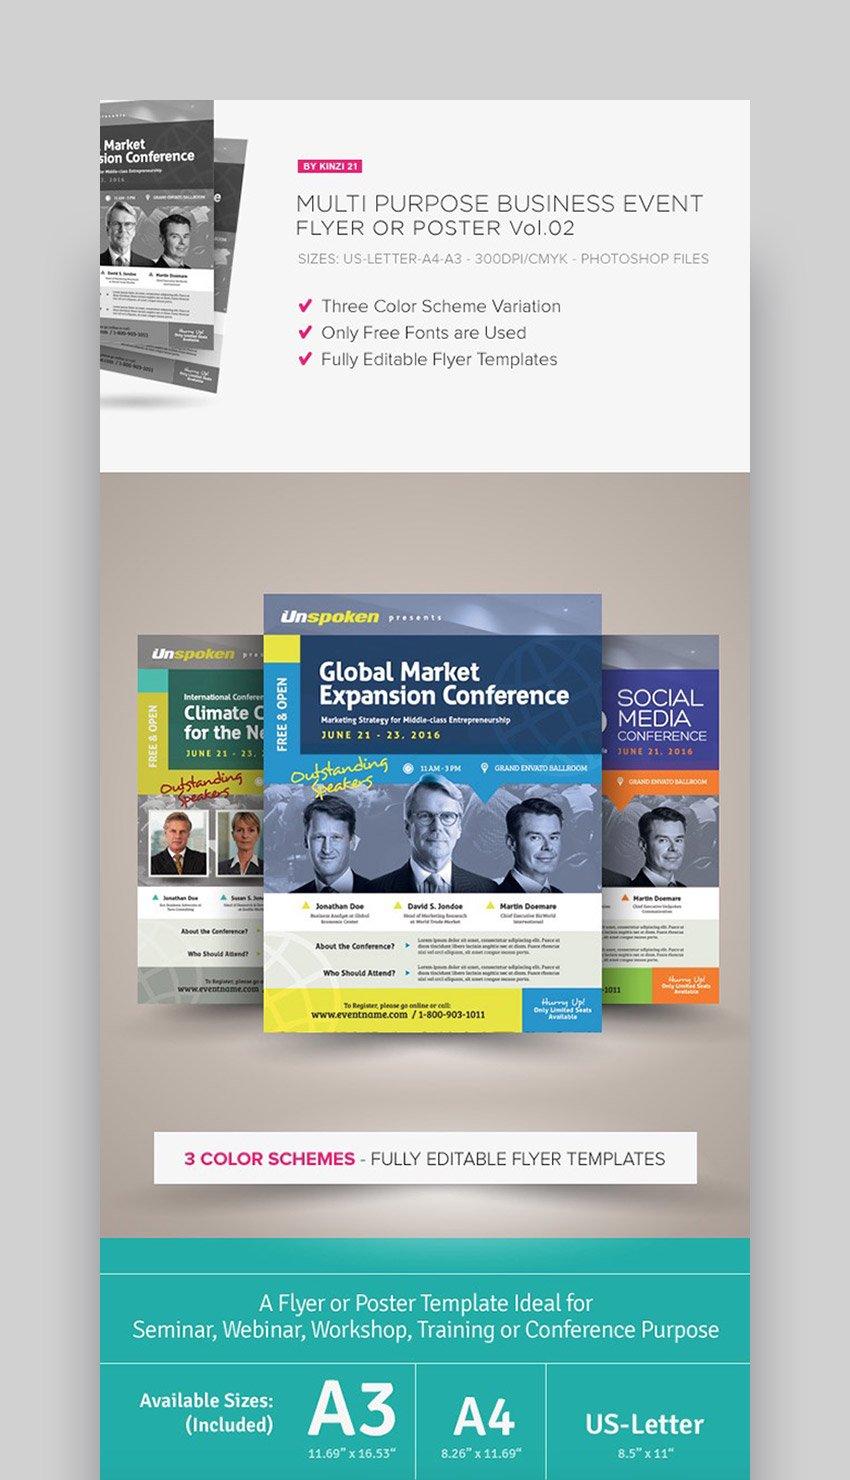 Multi-Purpose Advertising Business Event Flyer